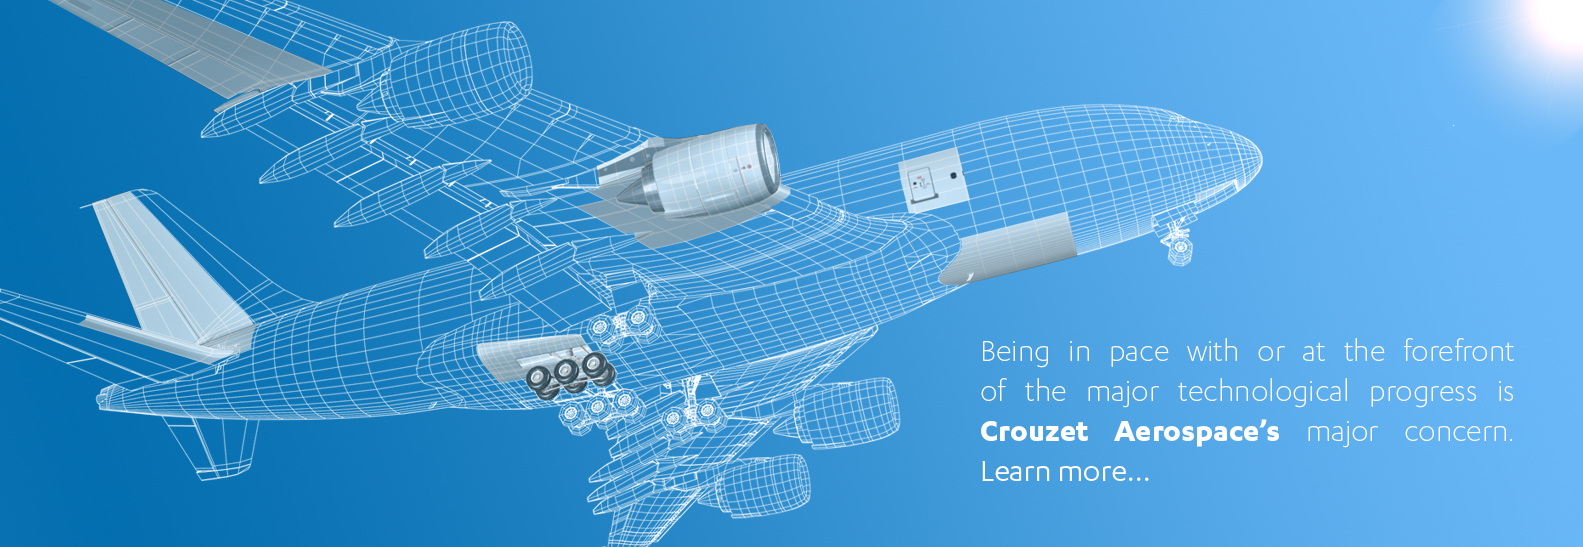 Crouzet Aerospace Technology Days